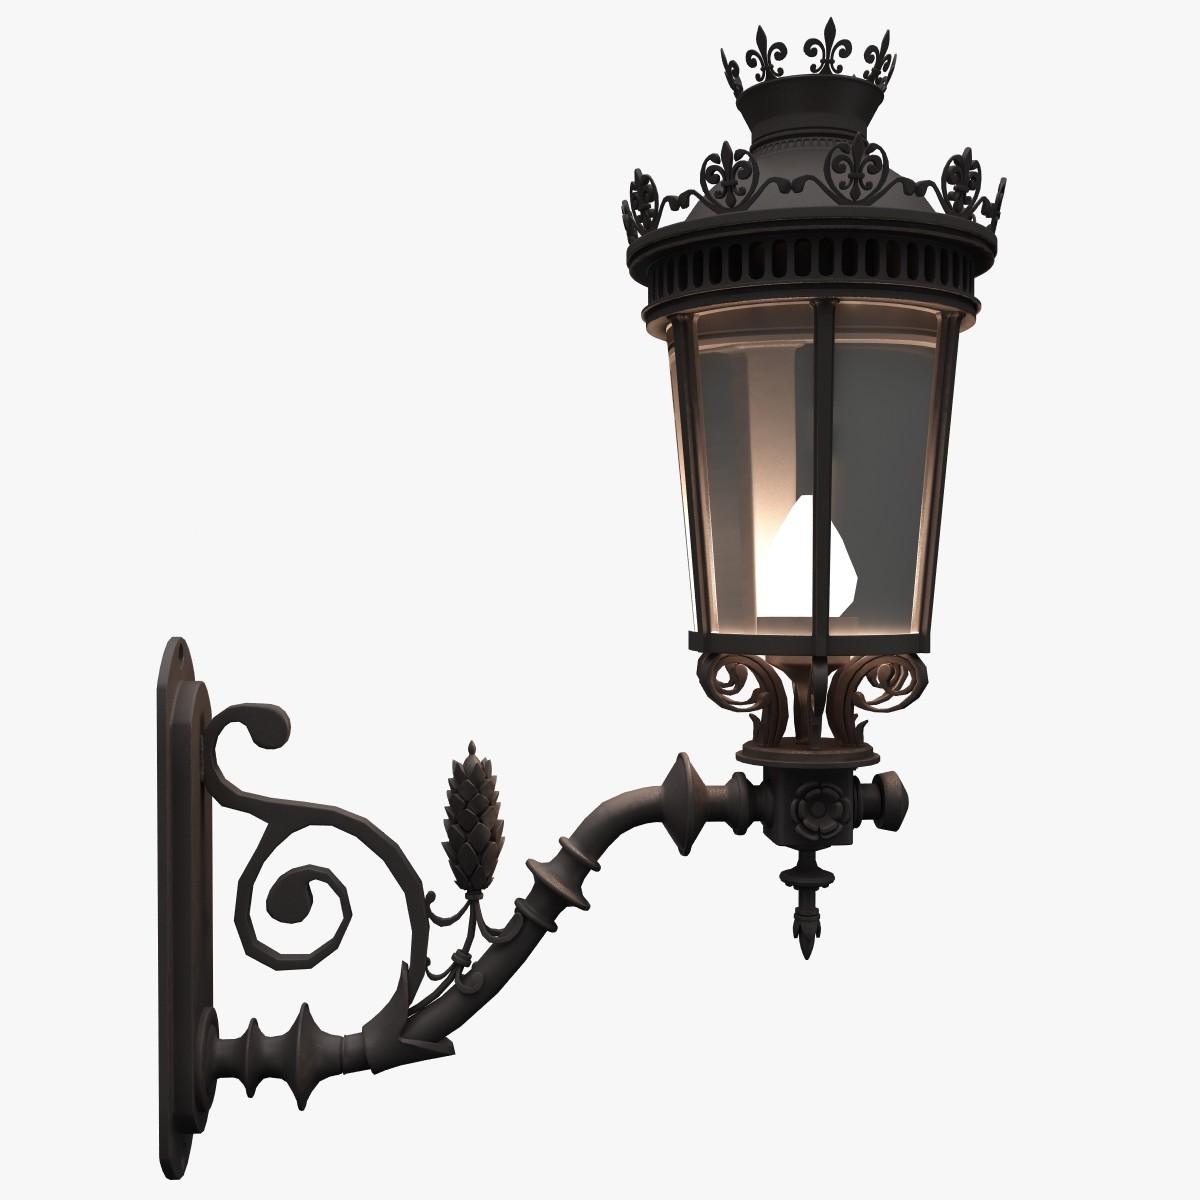 Top 10 Old Fashioned Street Lamps 2019 Warisan Lighting